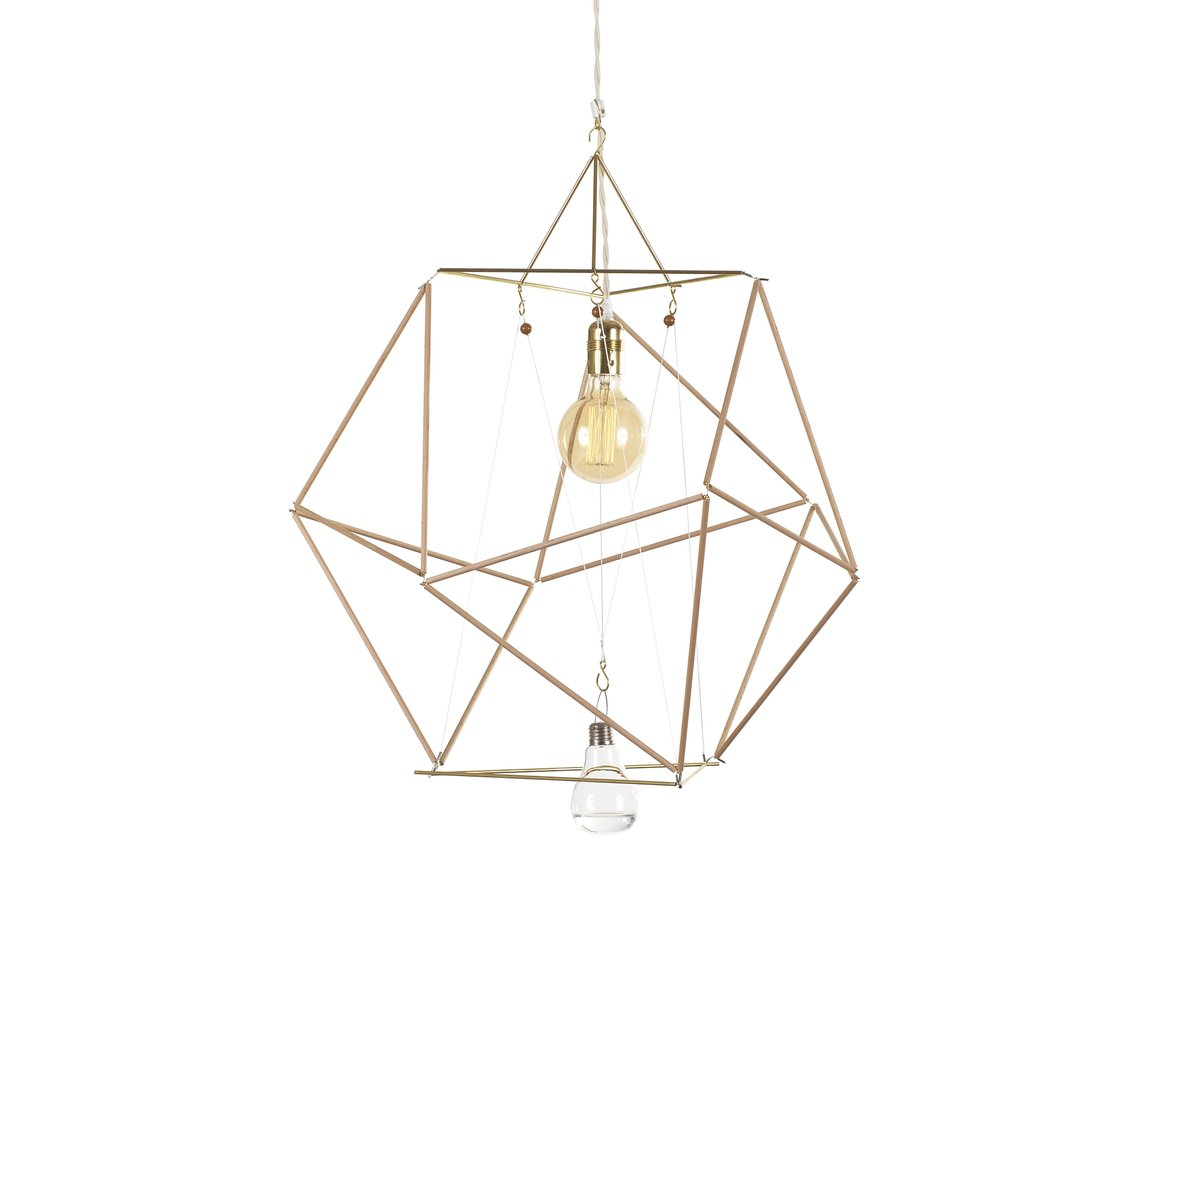 Modulare Vector Equilibrium Holzstab Lampe von Nicolas Brevers für Gob...